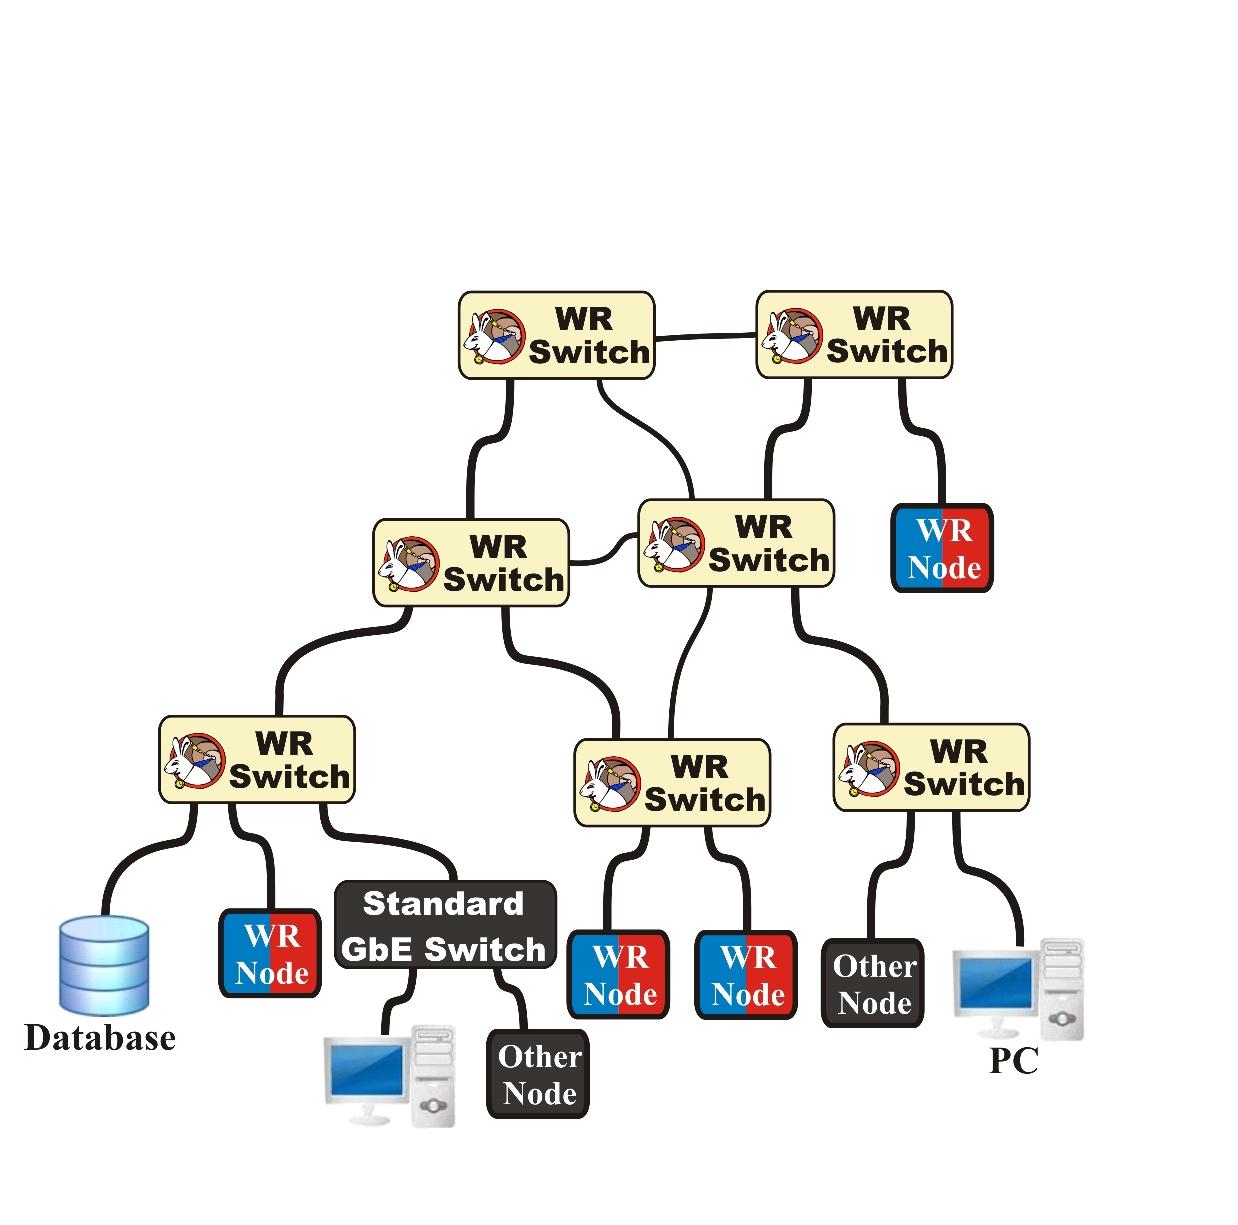 figures/network/wr_network-ethernet.jpg